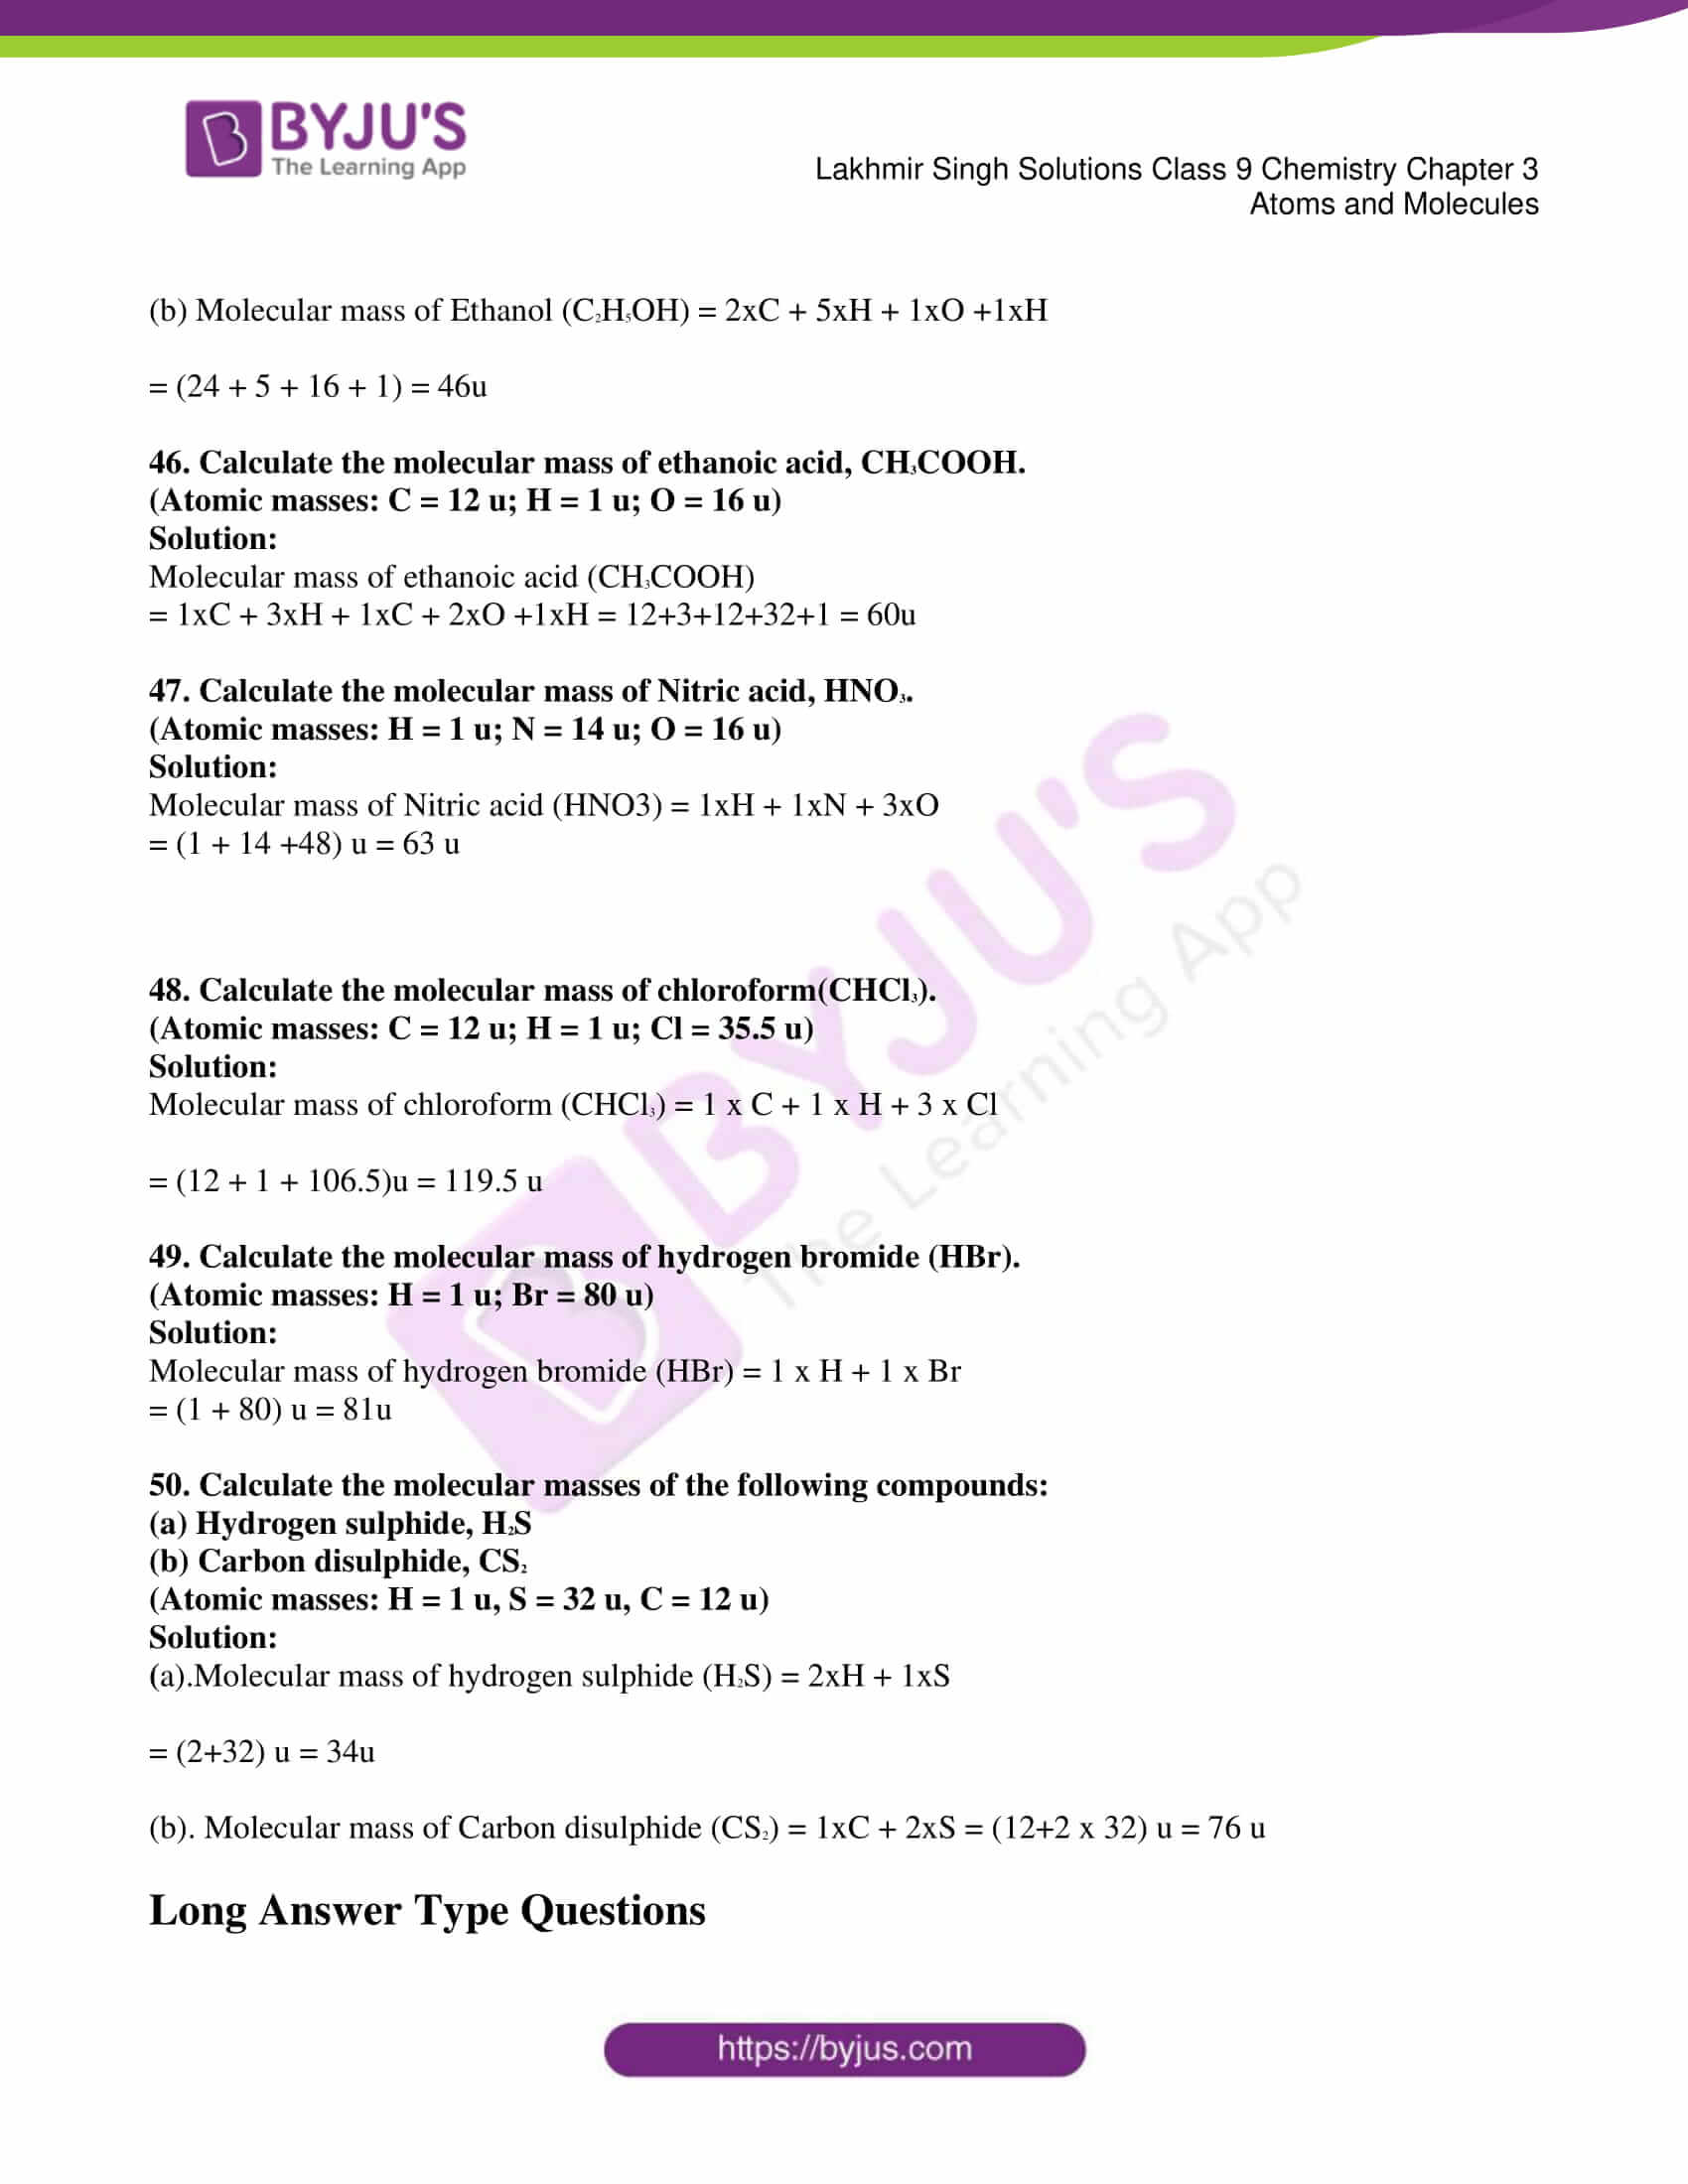 lakhmir singh solutions class 9 chemistry chapter 3 08